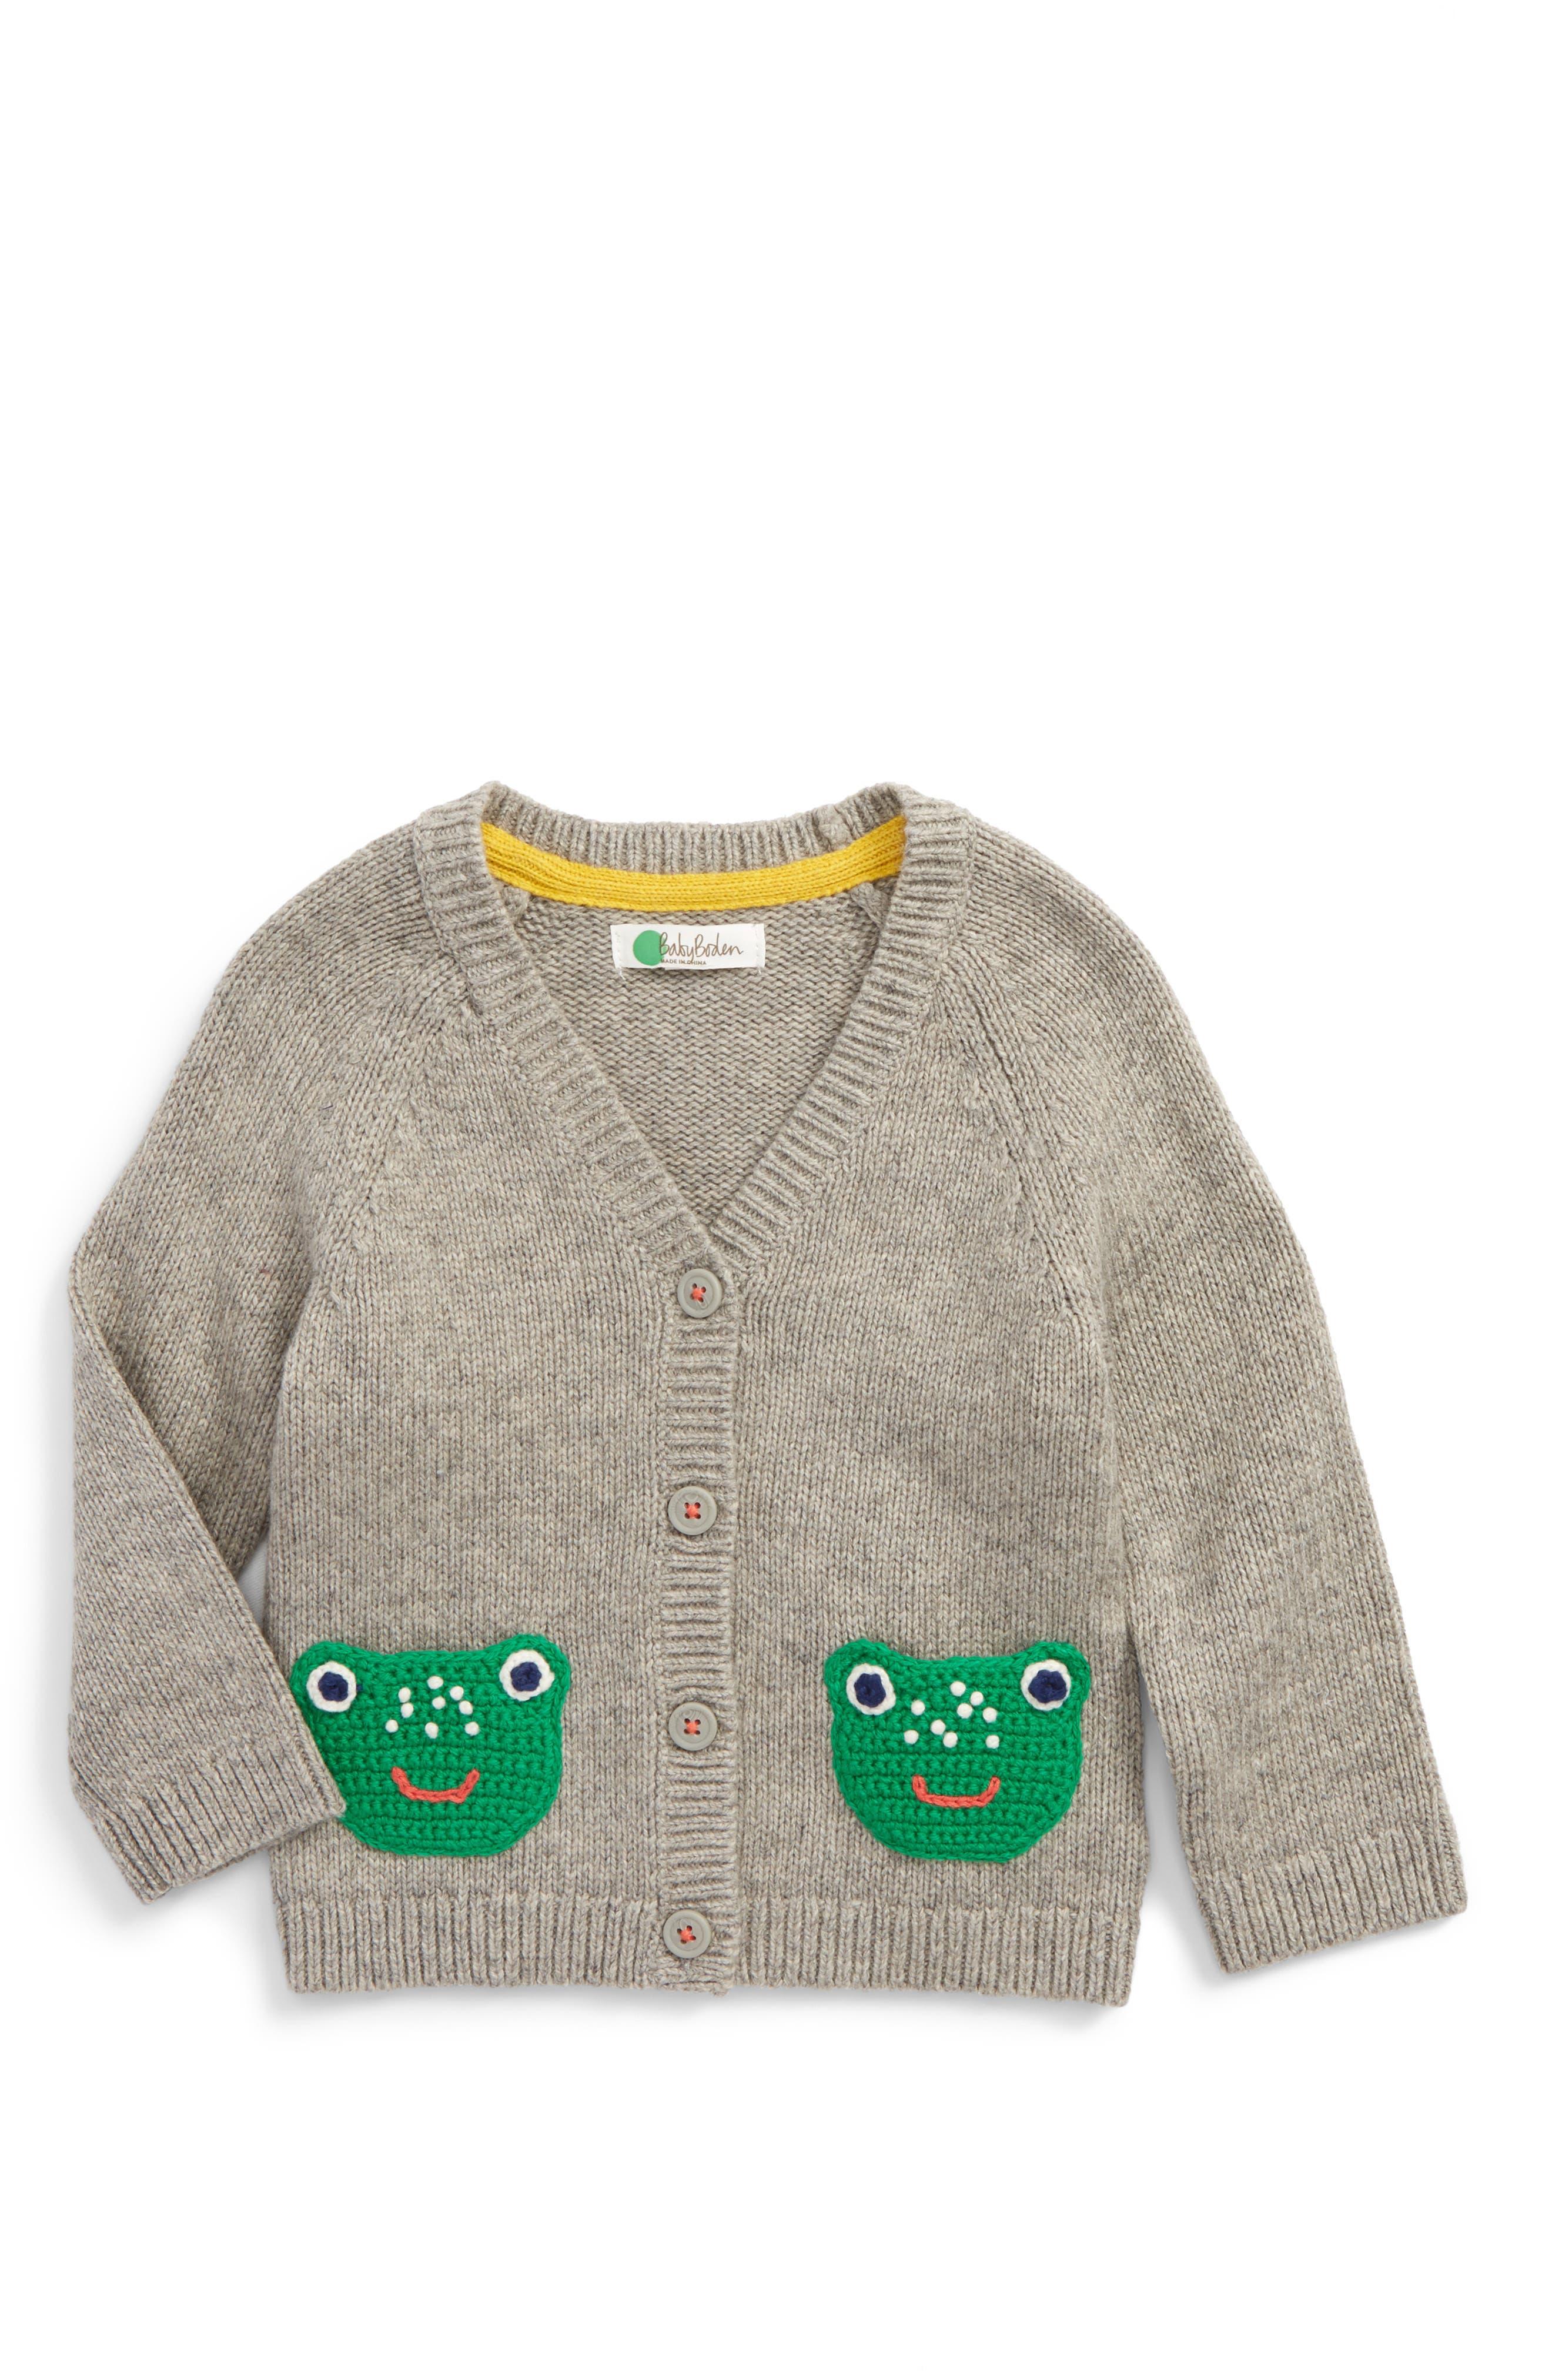 Crochet Friends Cardigan,                             Main thumbnail 1, color,                             Grey Marl Frogs